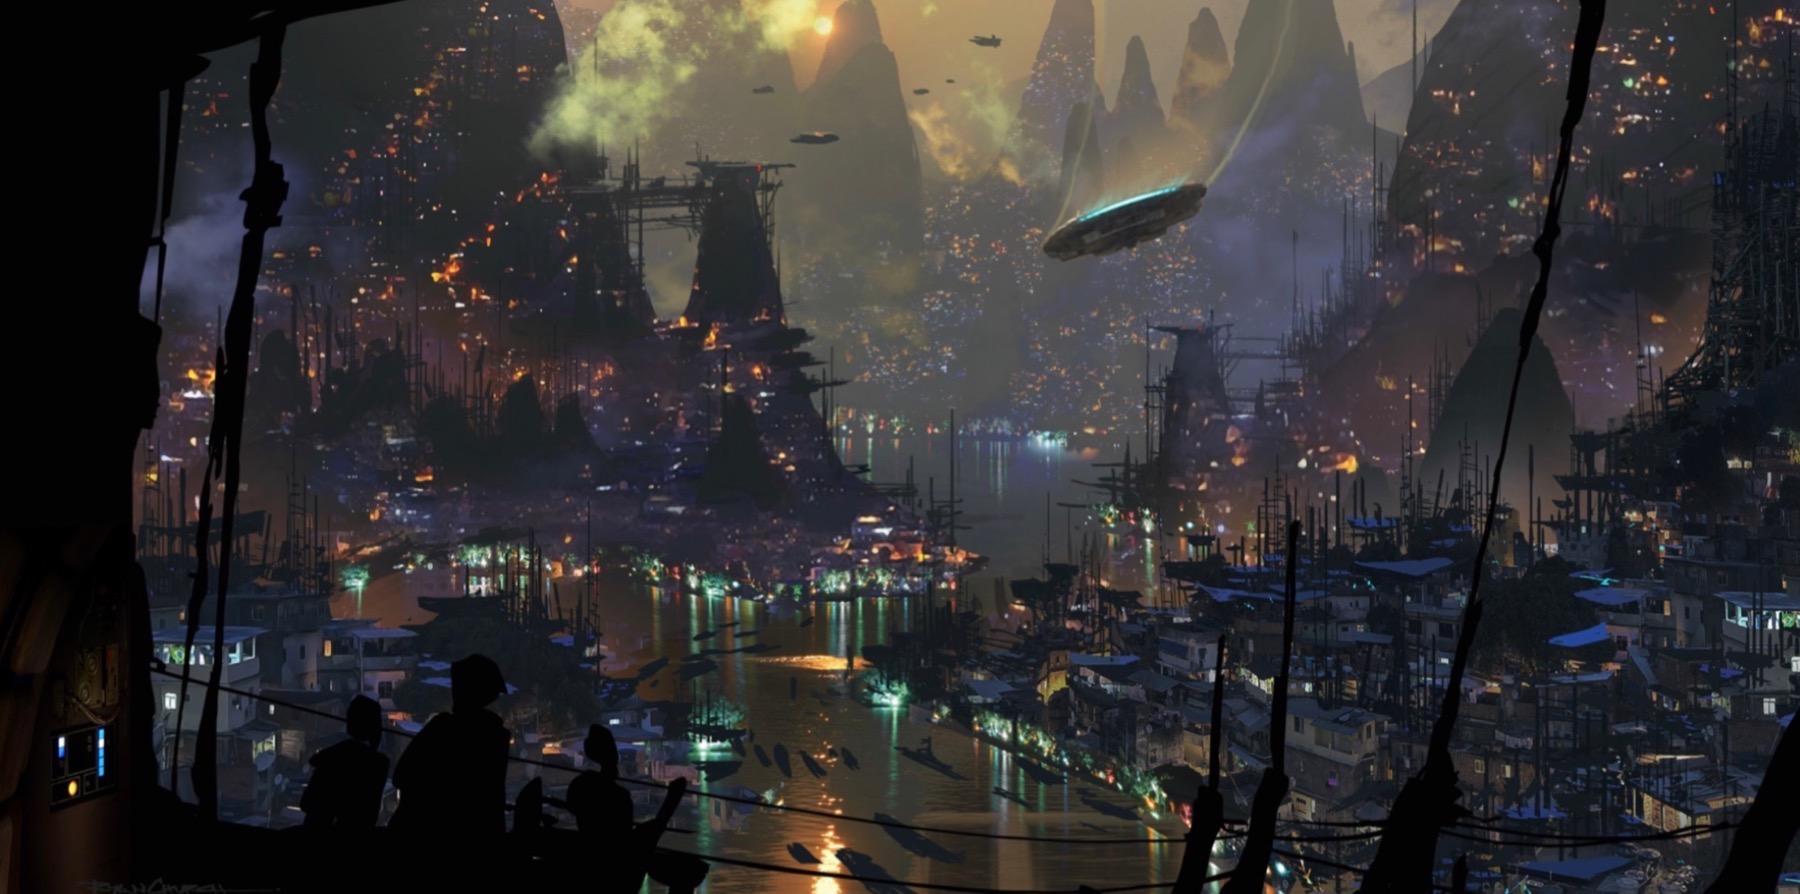 https://www.starwars-universe.com/images/actualites/episode9/conceptarts_trevorrow/04.jpg